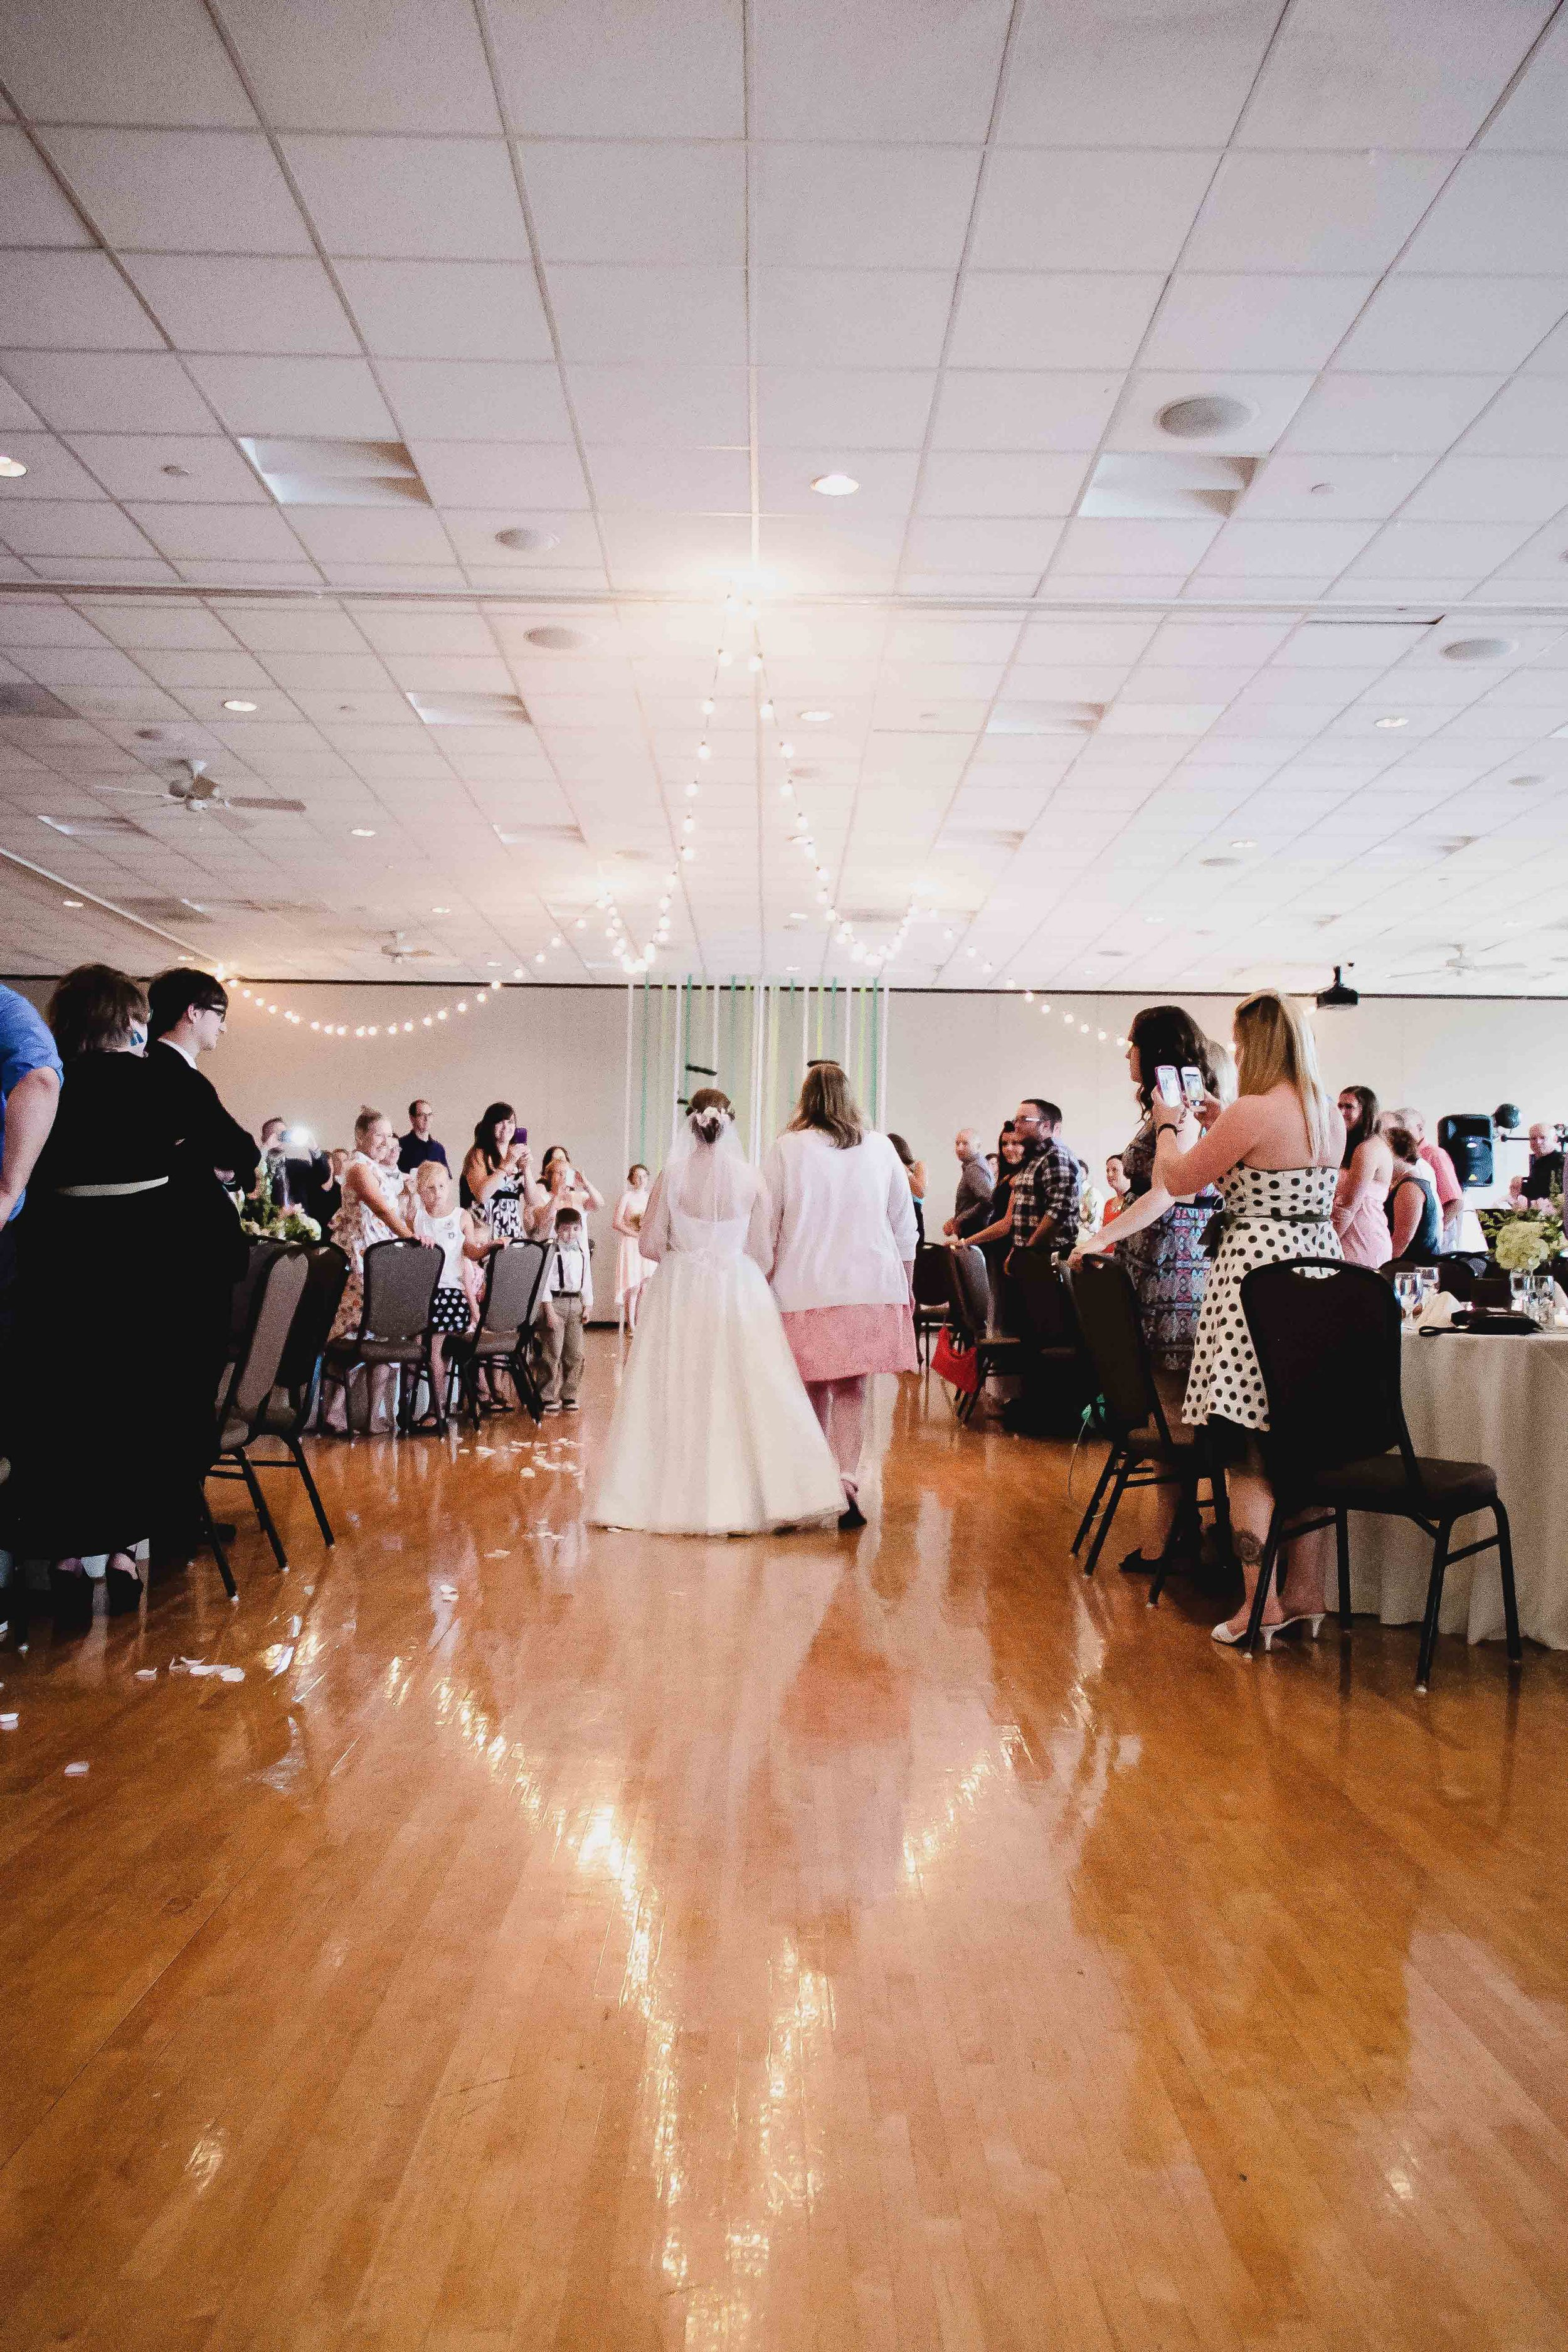 abcde wedding (77).jpg